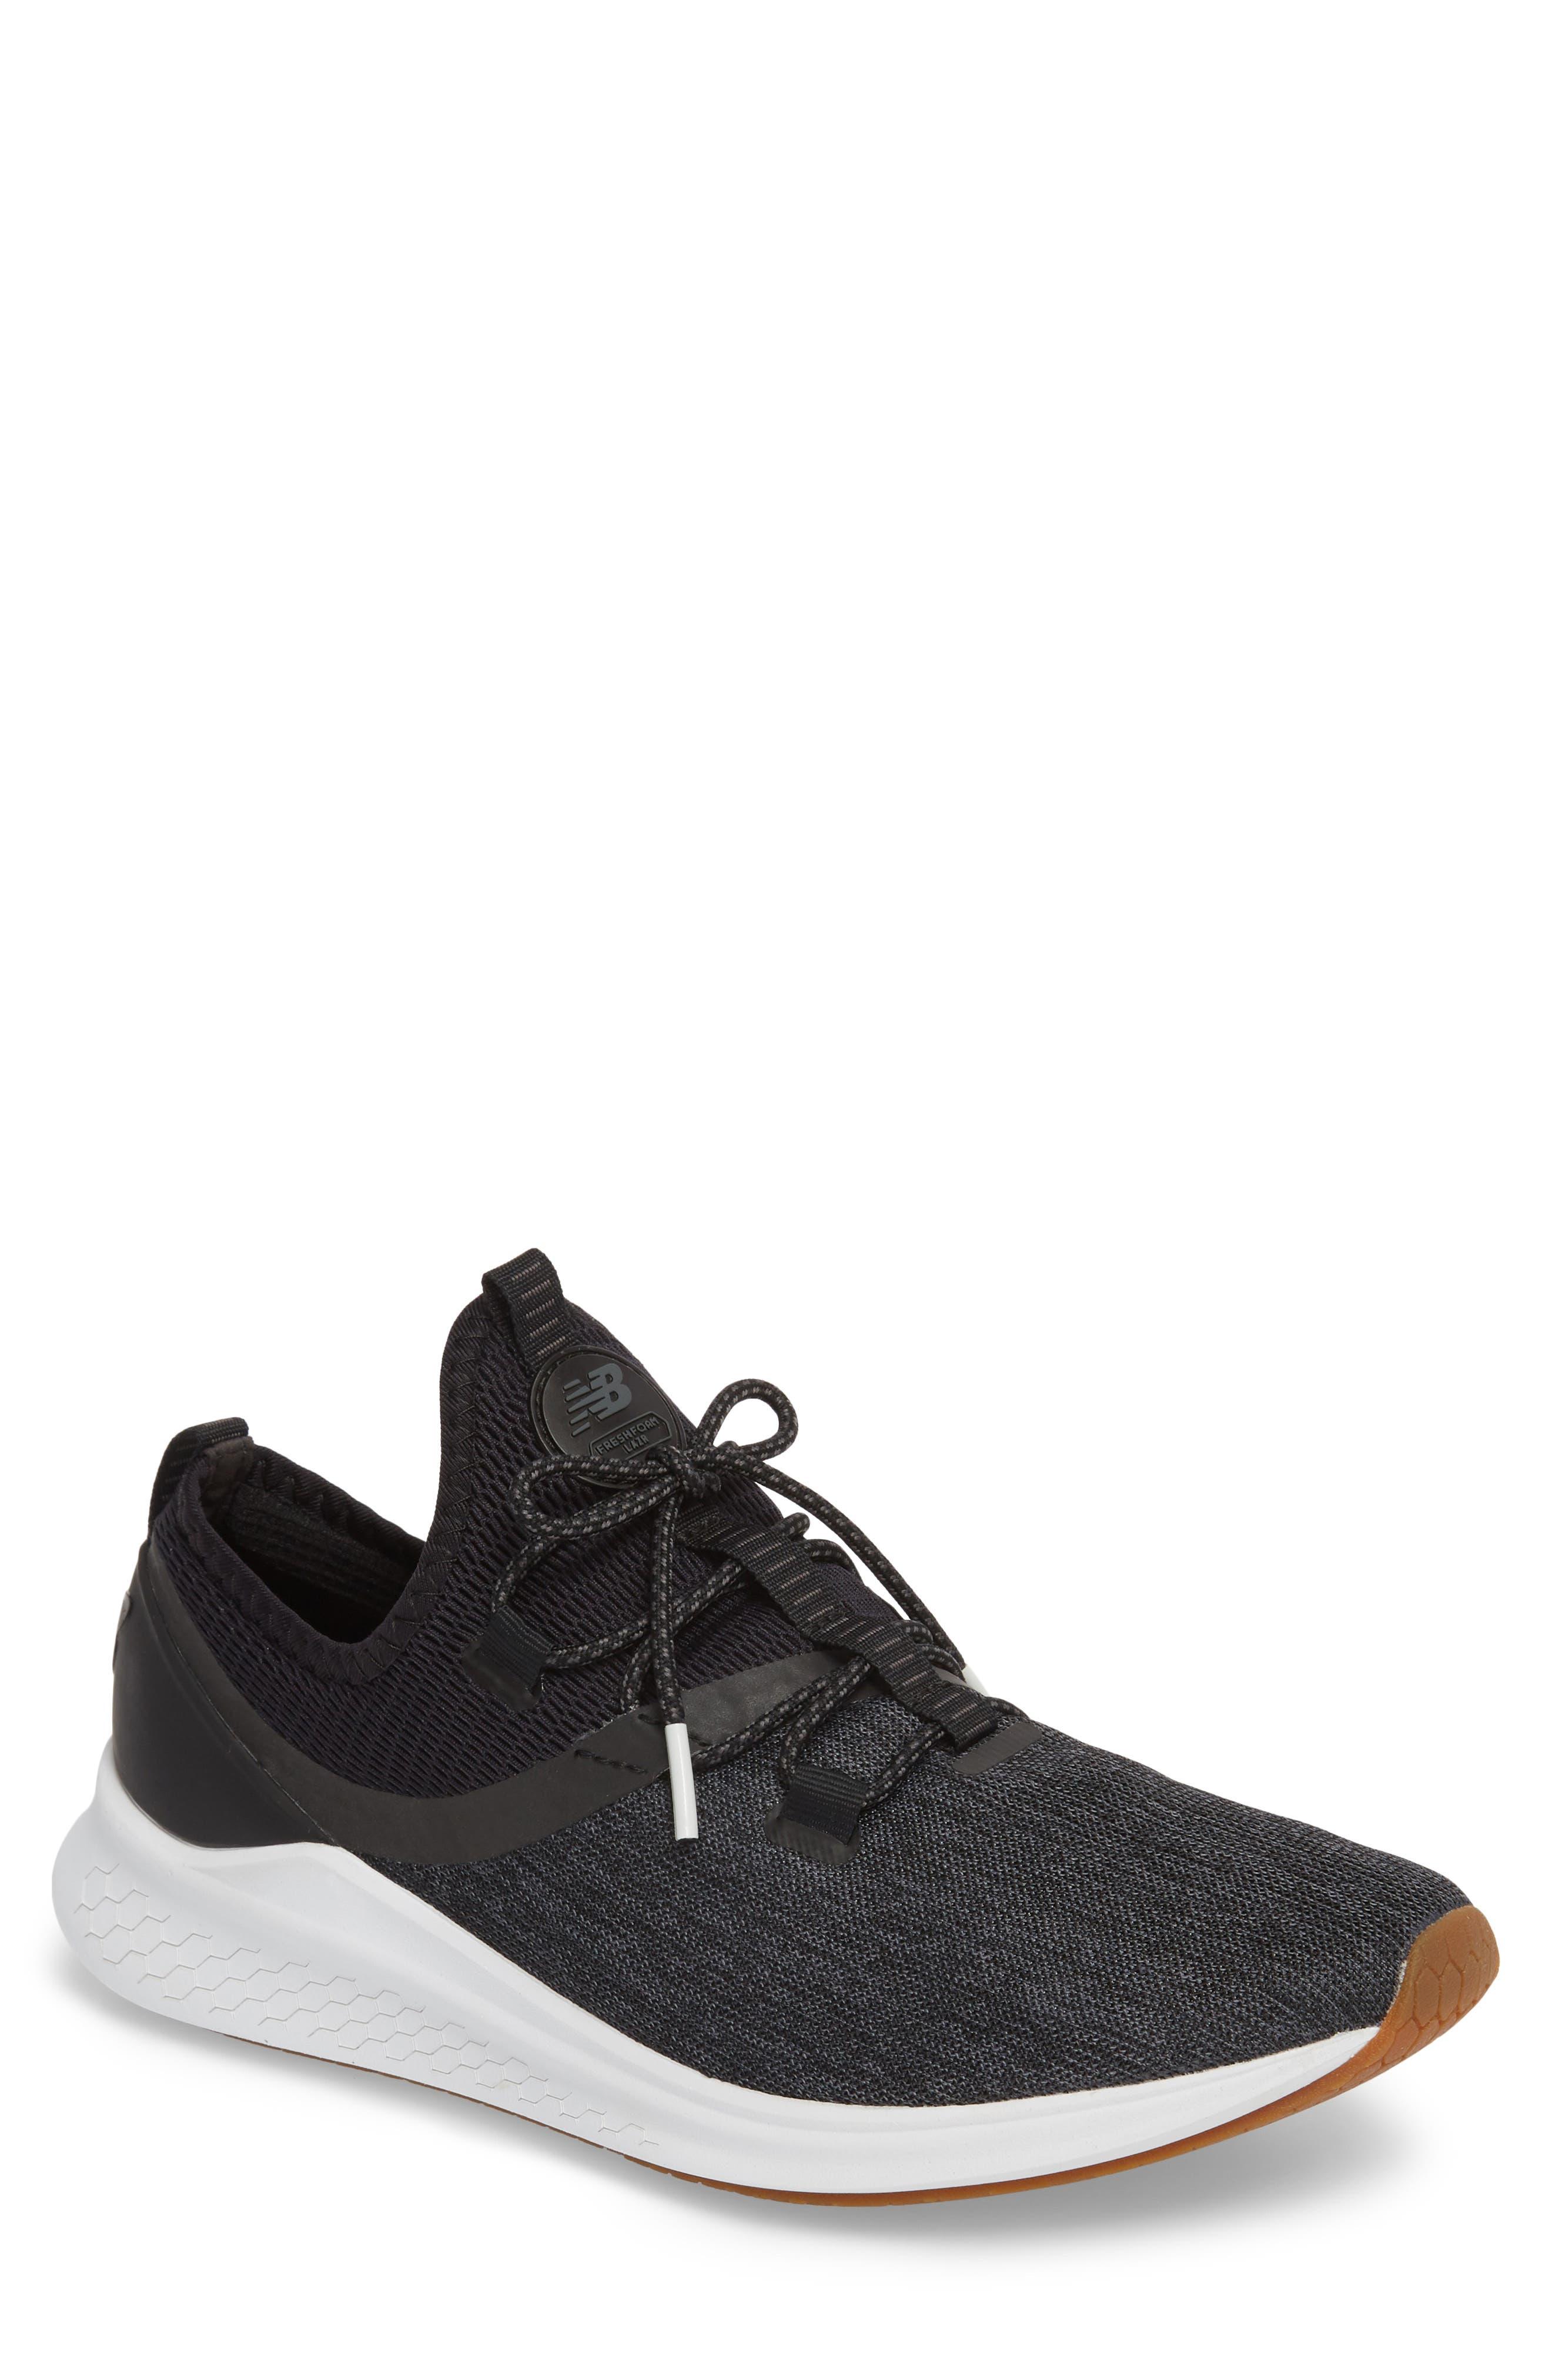 New Balance Fresh Foam Lazr Denim Fresh Foam Running Shoe (Men)